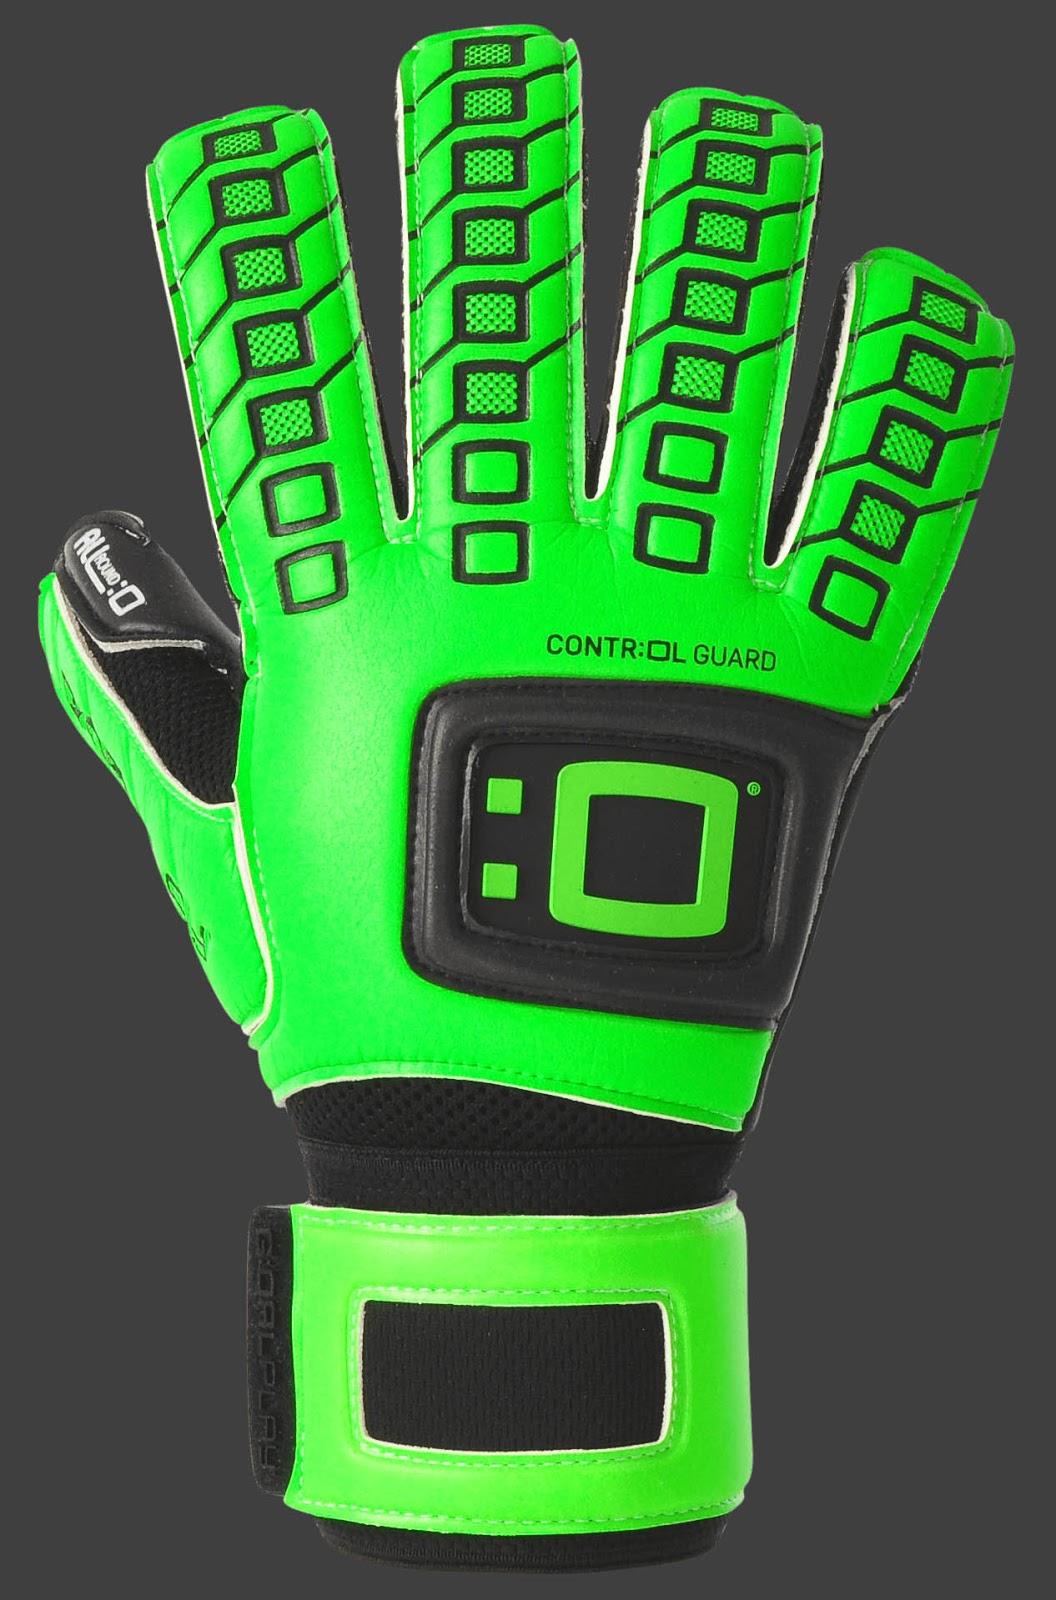 goodbye-adidas-oliver-kahn-launches-goalkeeper-brand-green